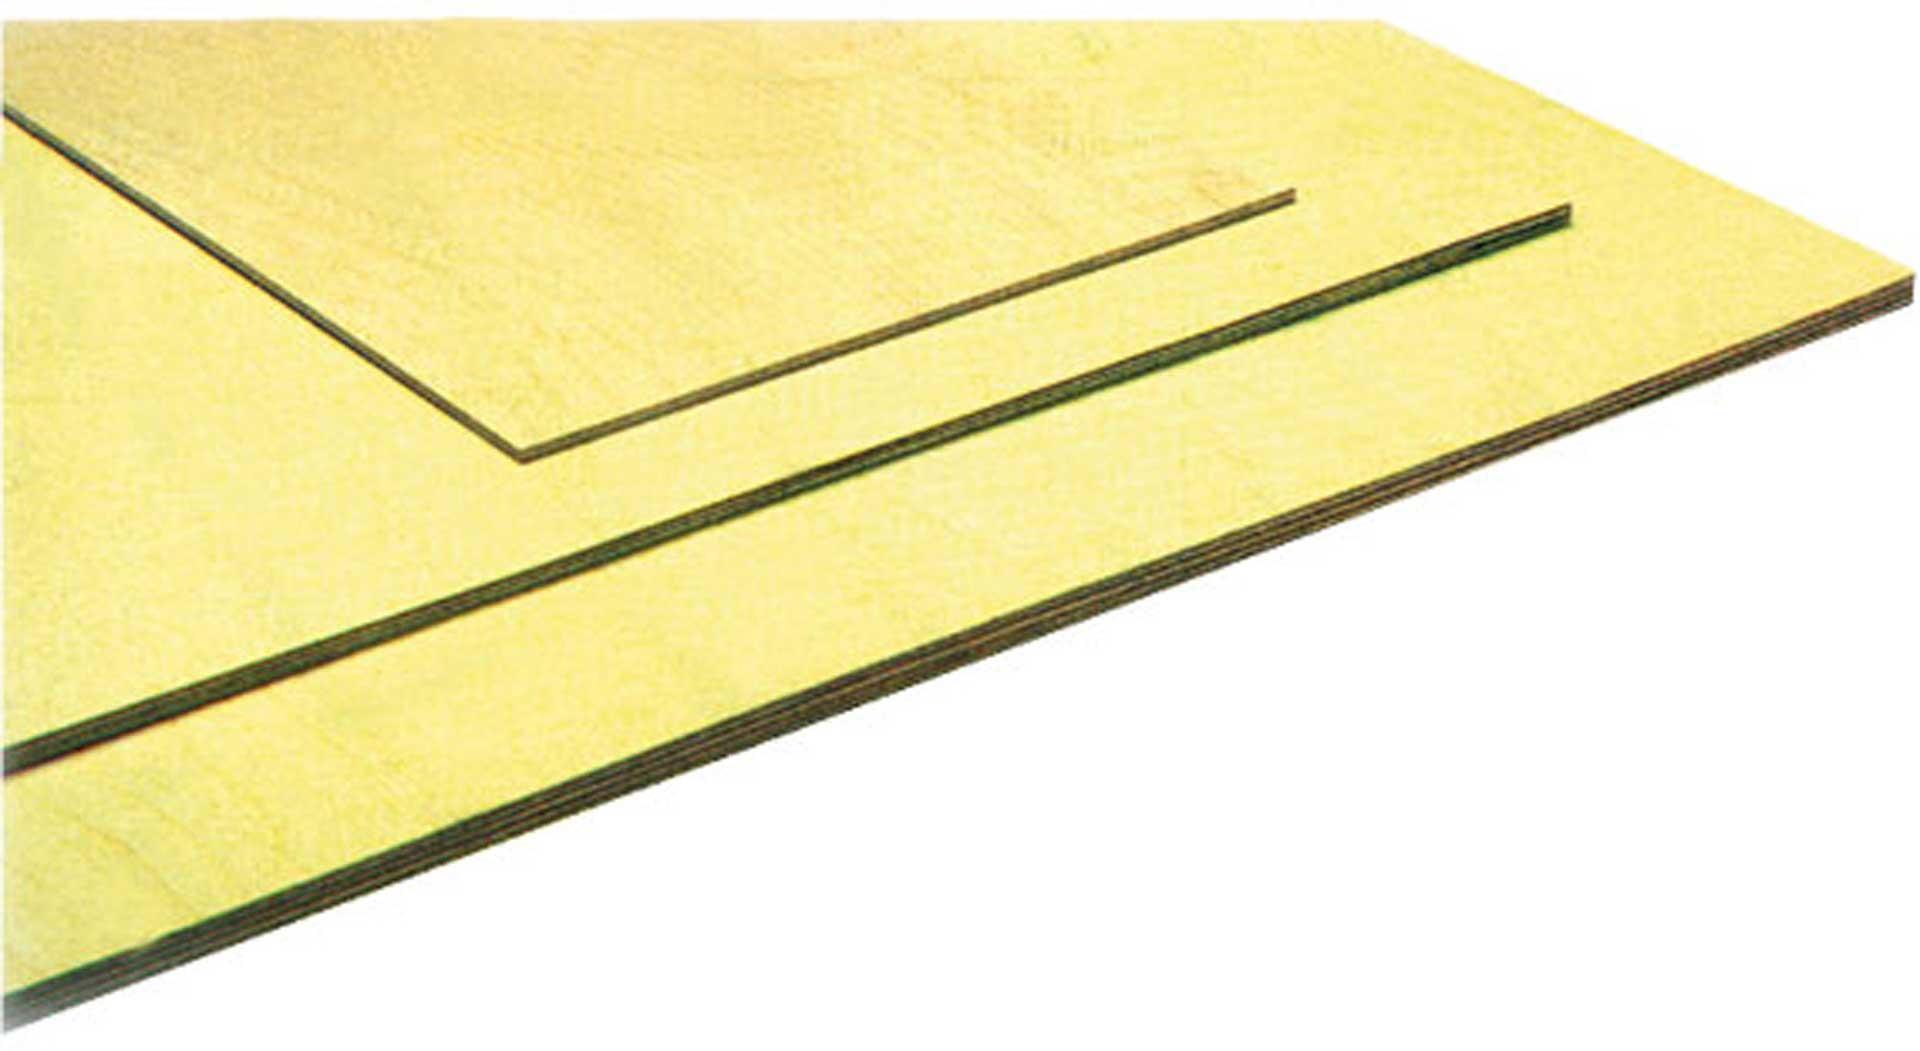 MODELLBAU LINDINGER BIRCH-SPERWOOD 4,0/300/500MM